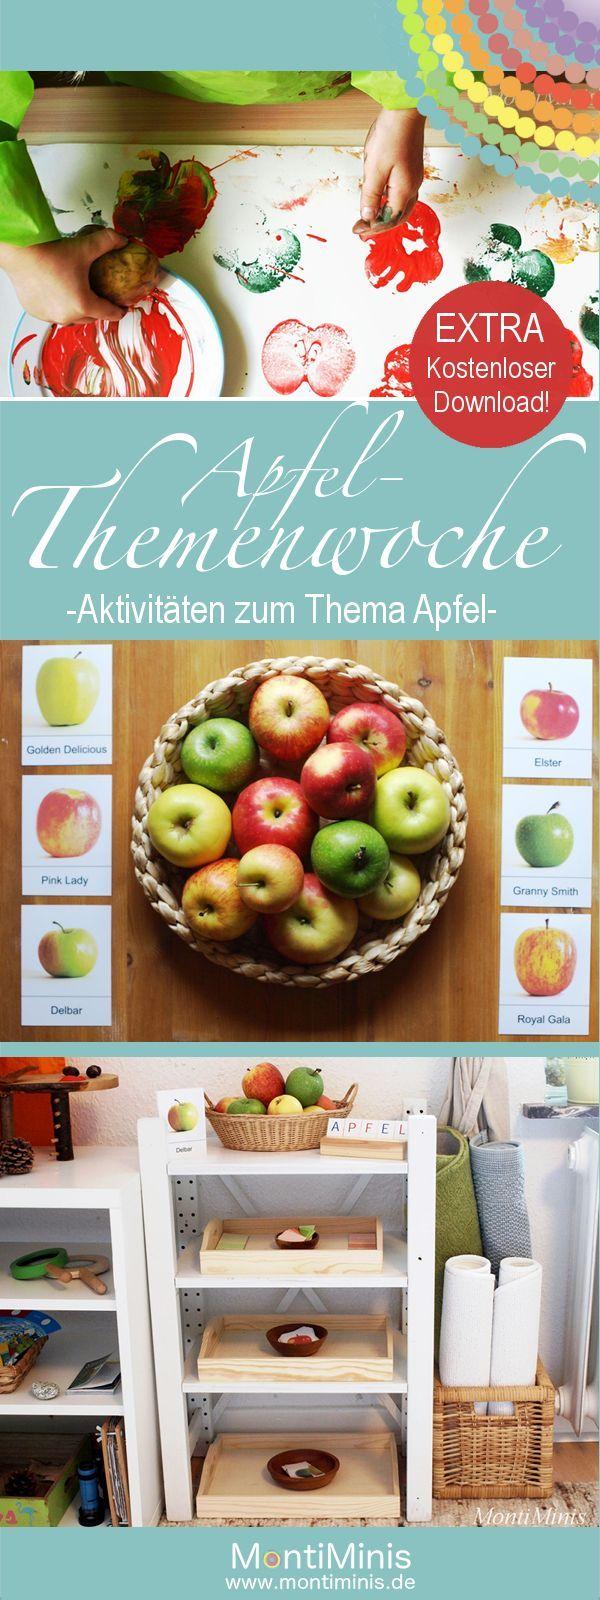 Apfel themenwoche plus download autumn herbst for Projekte im kindergarten herbst